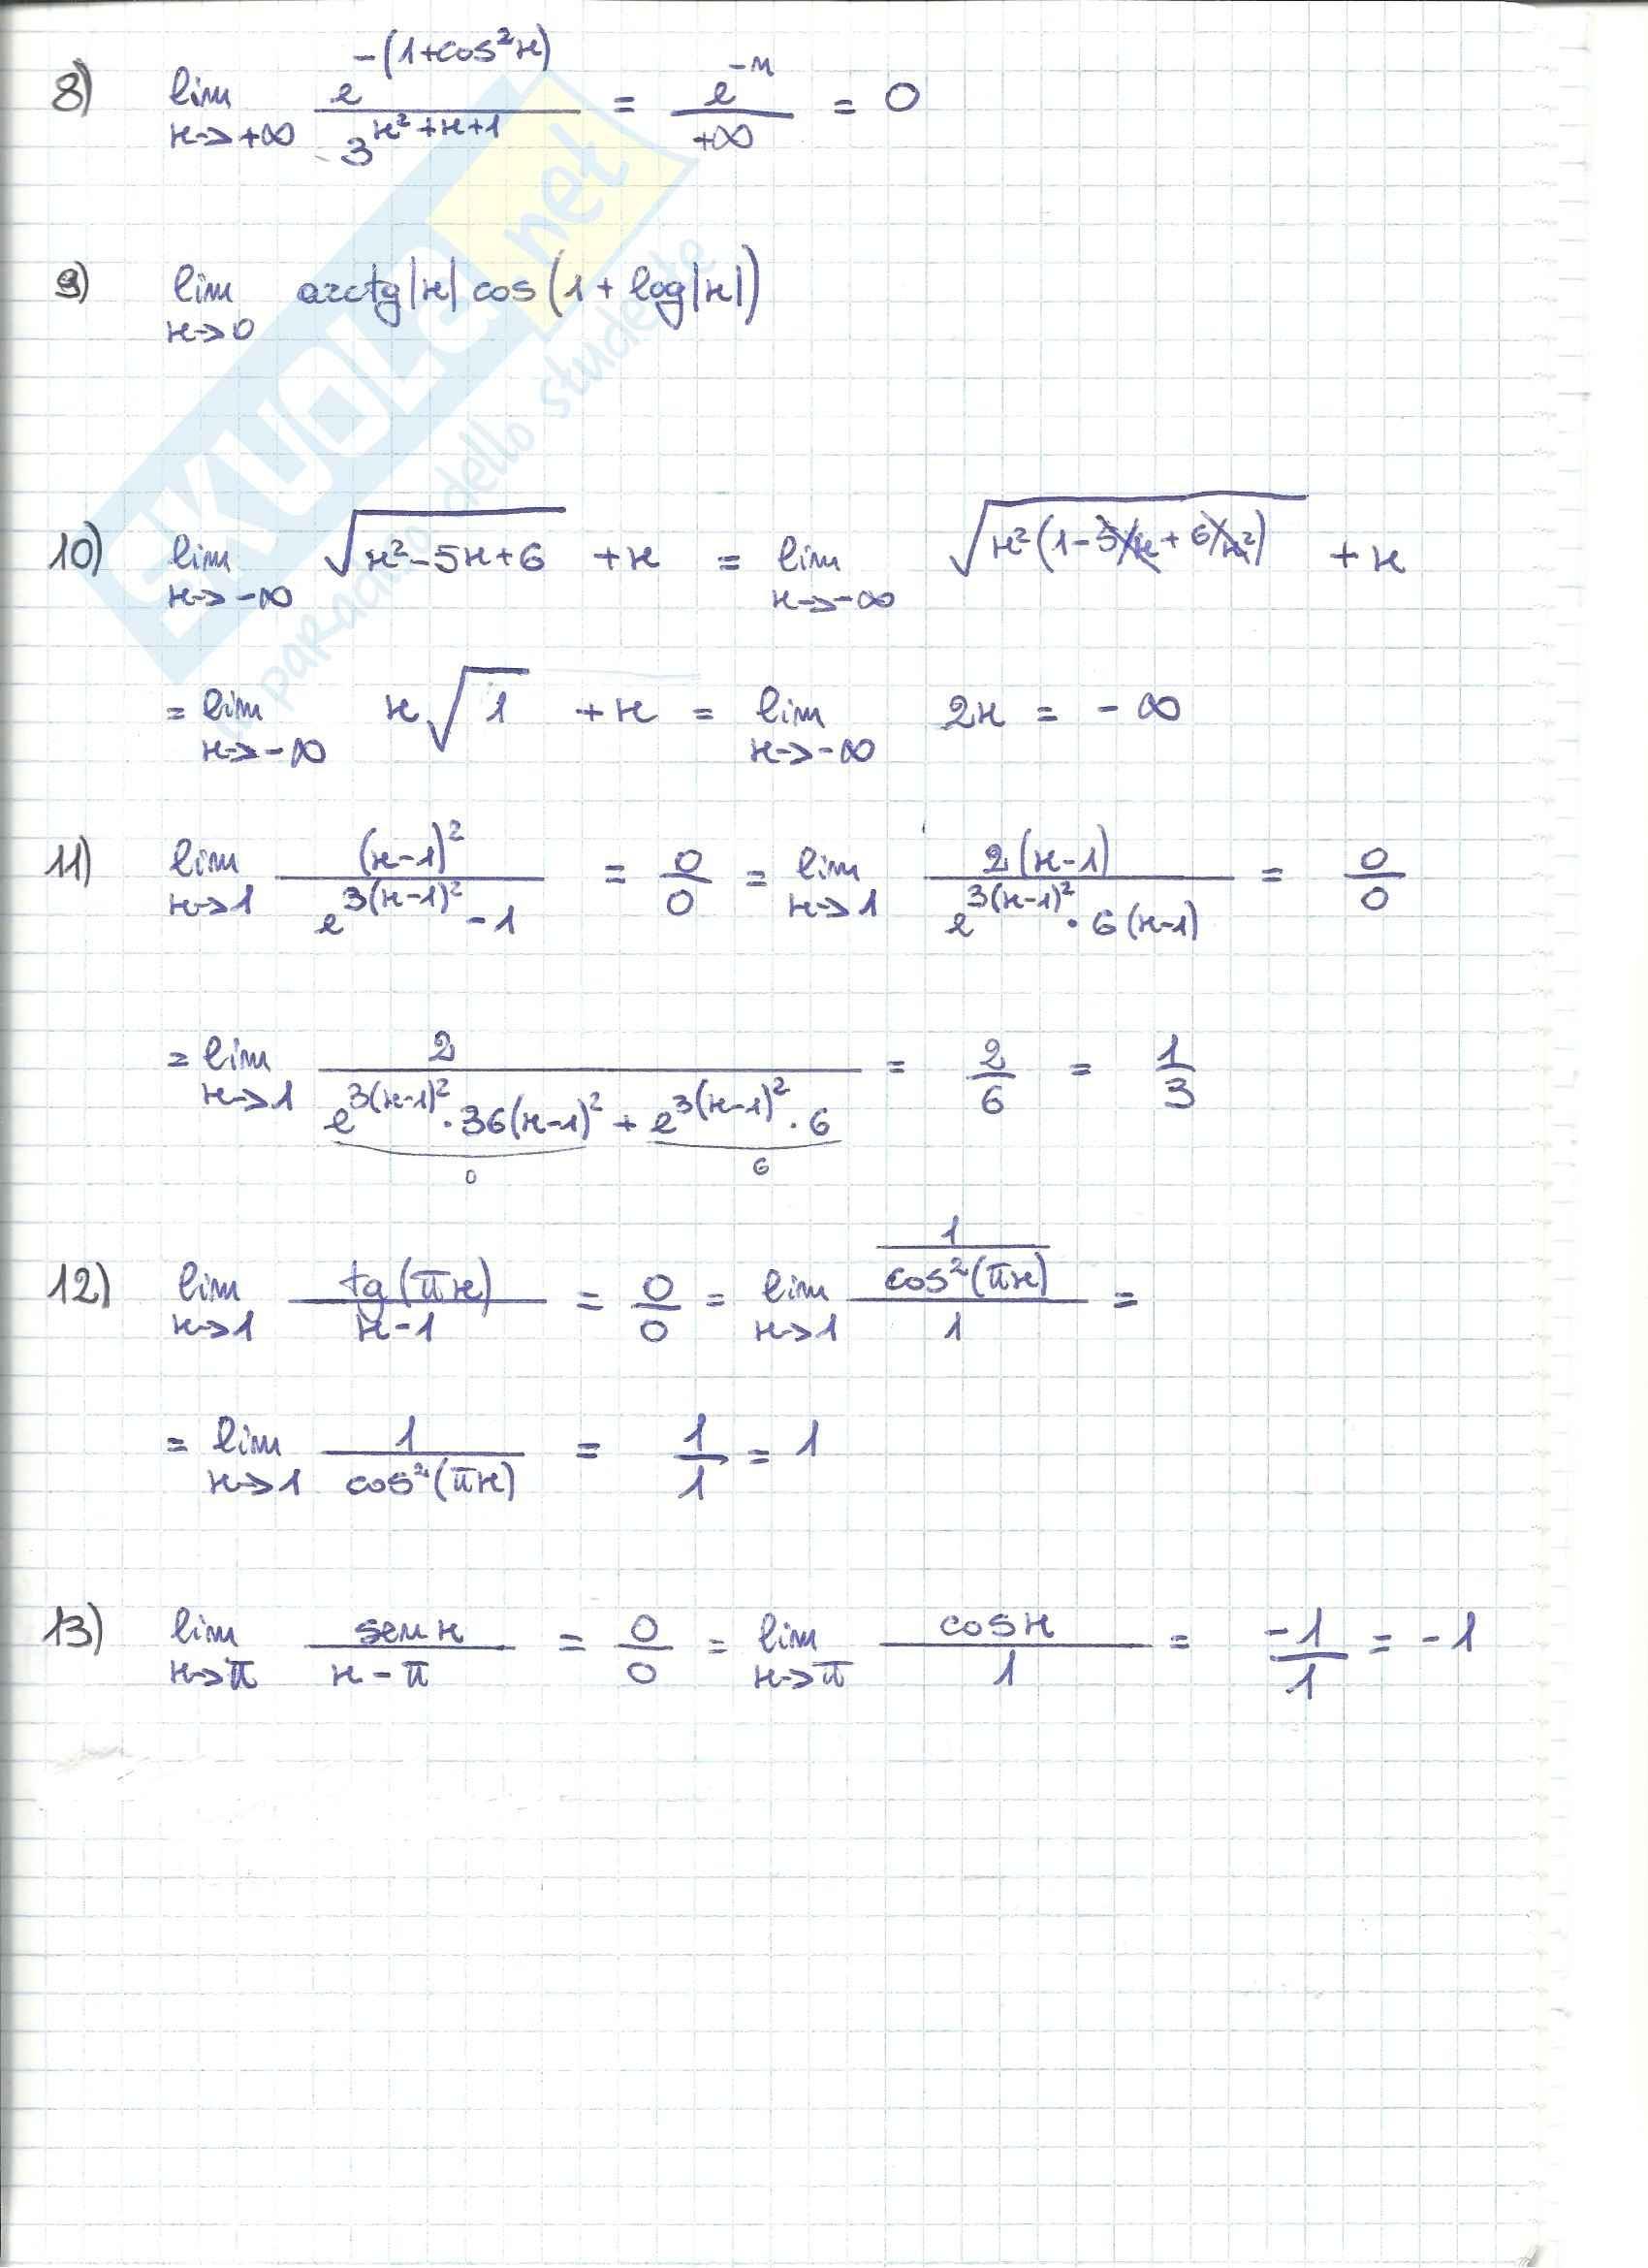 Analisi matematica 1 - esercizi Pag. 16